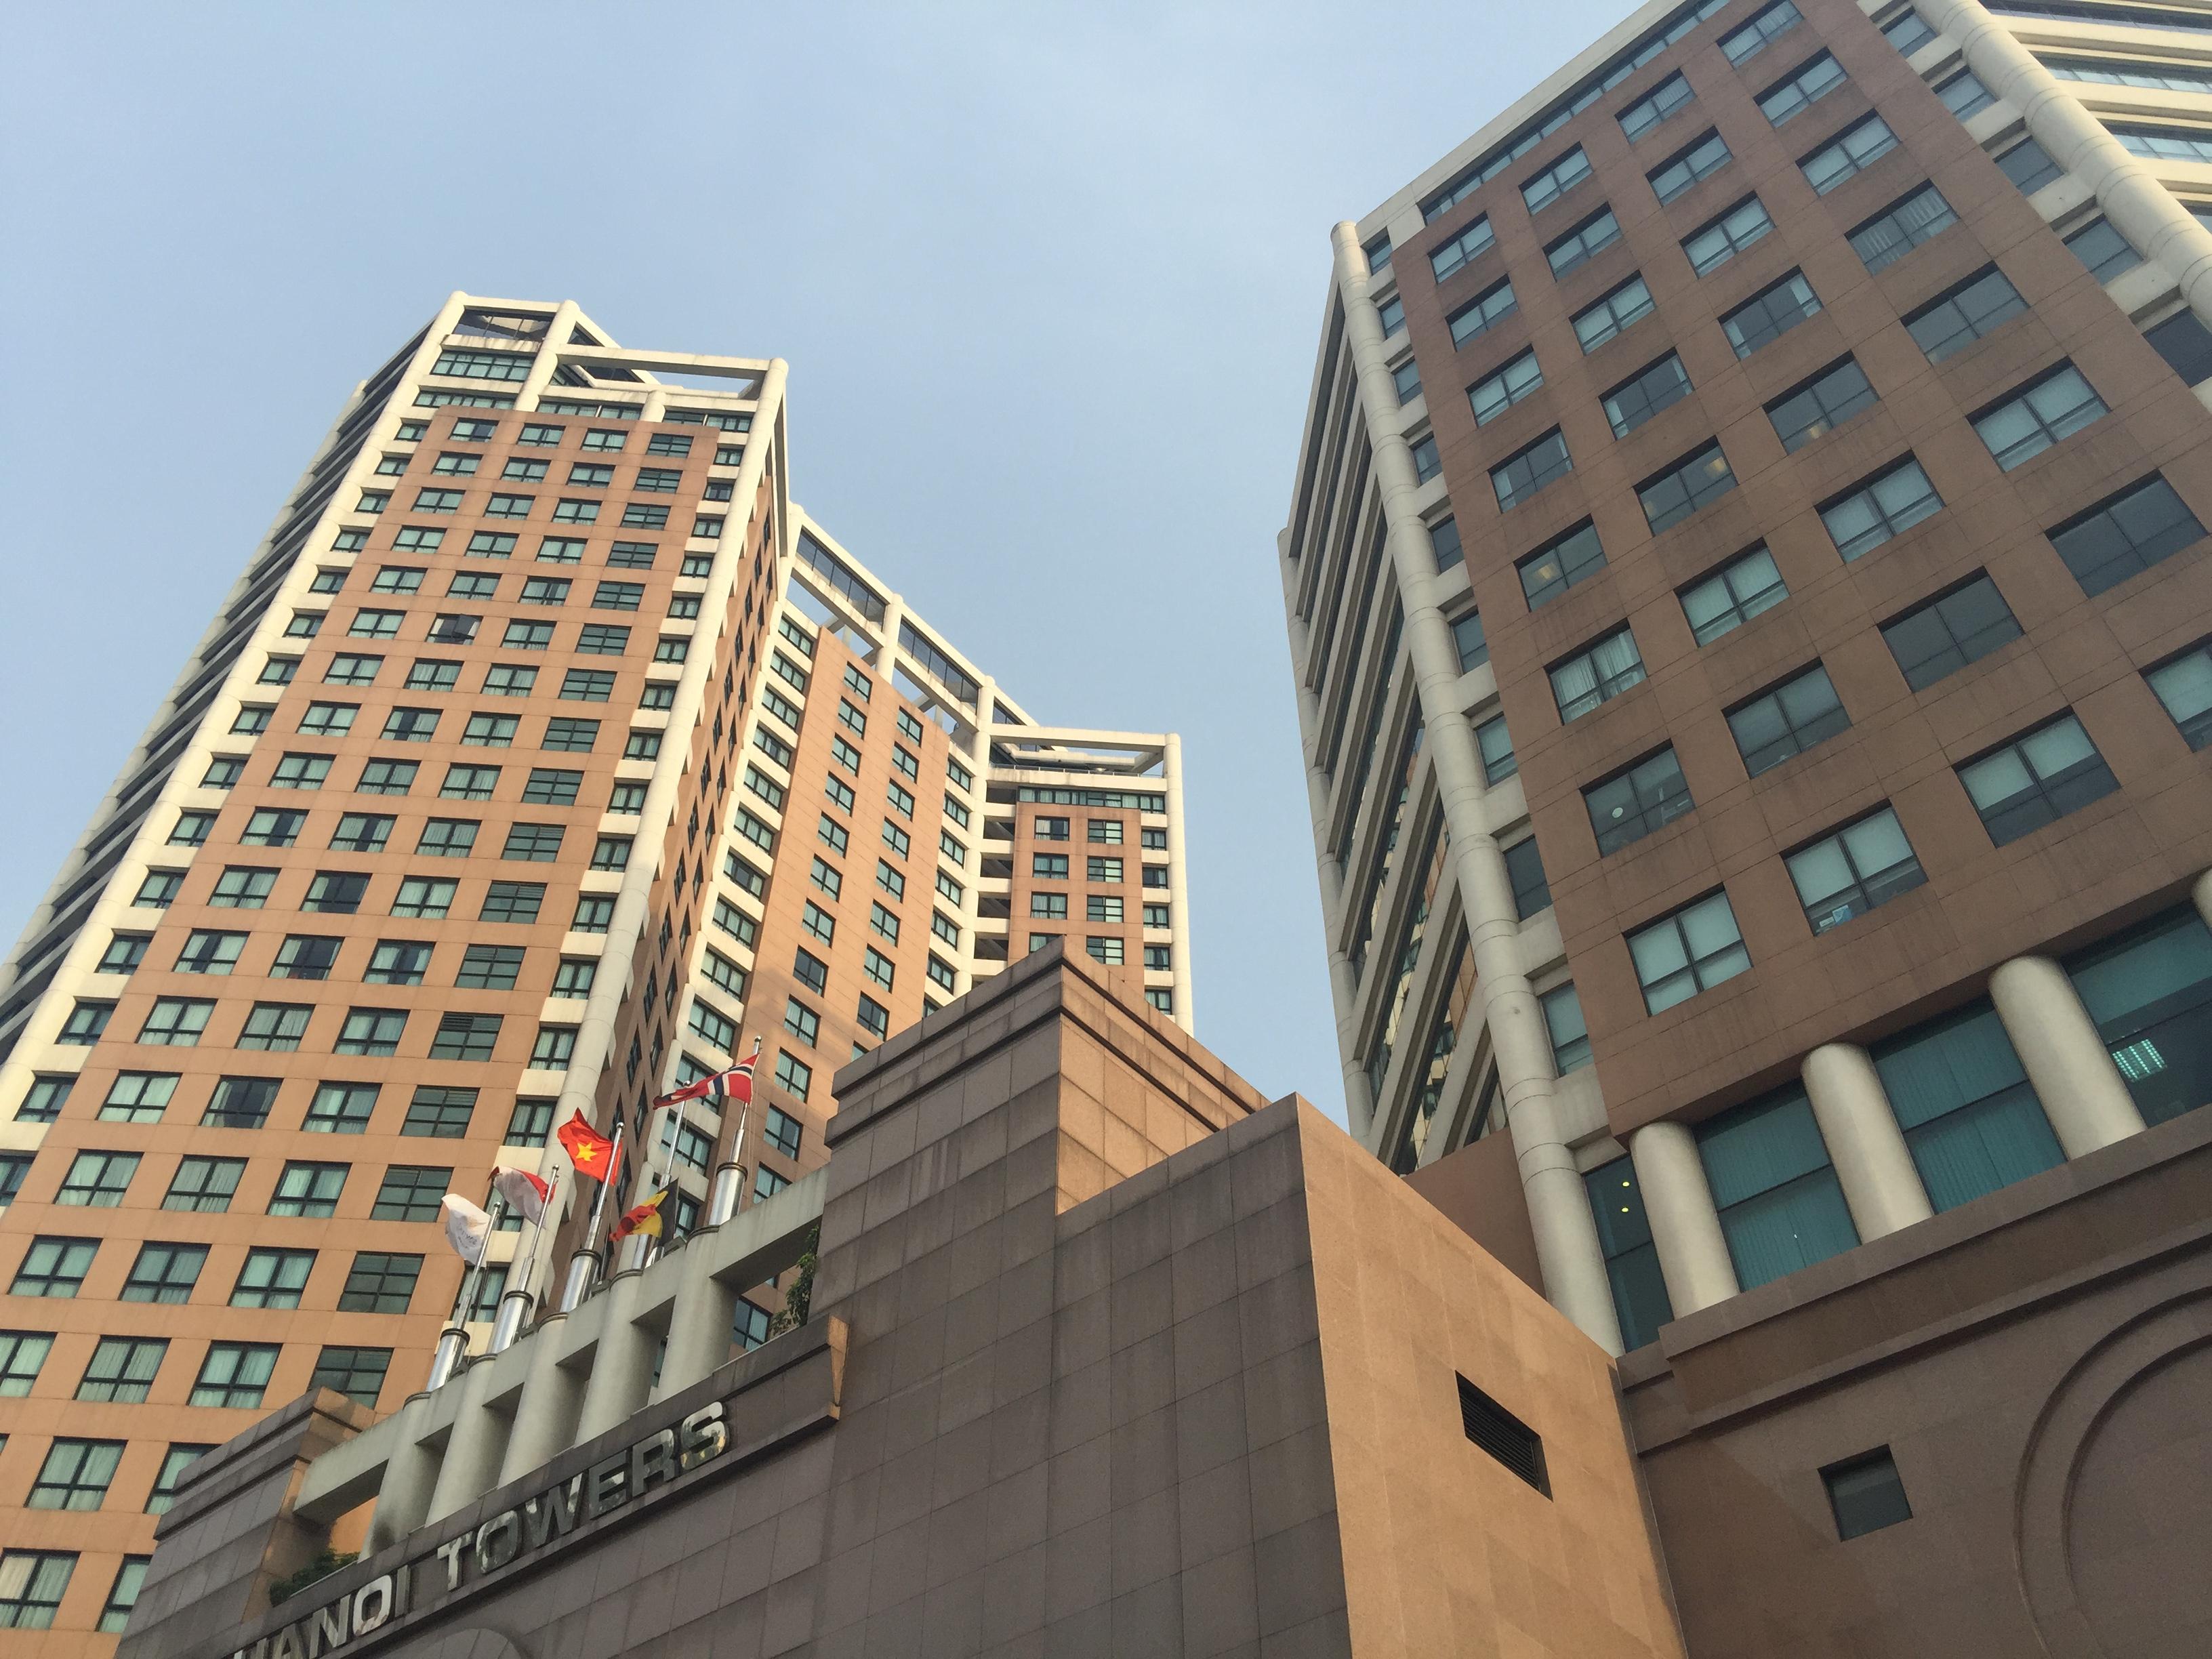 vietnamesisk ambassade oslo